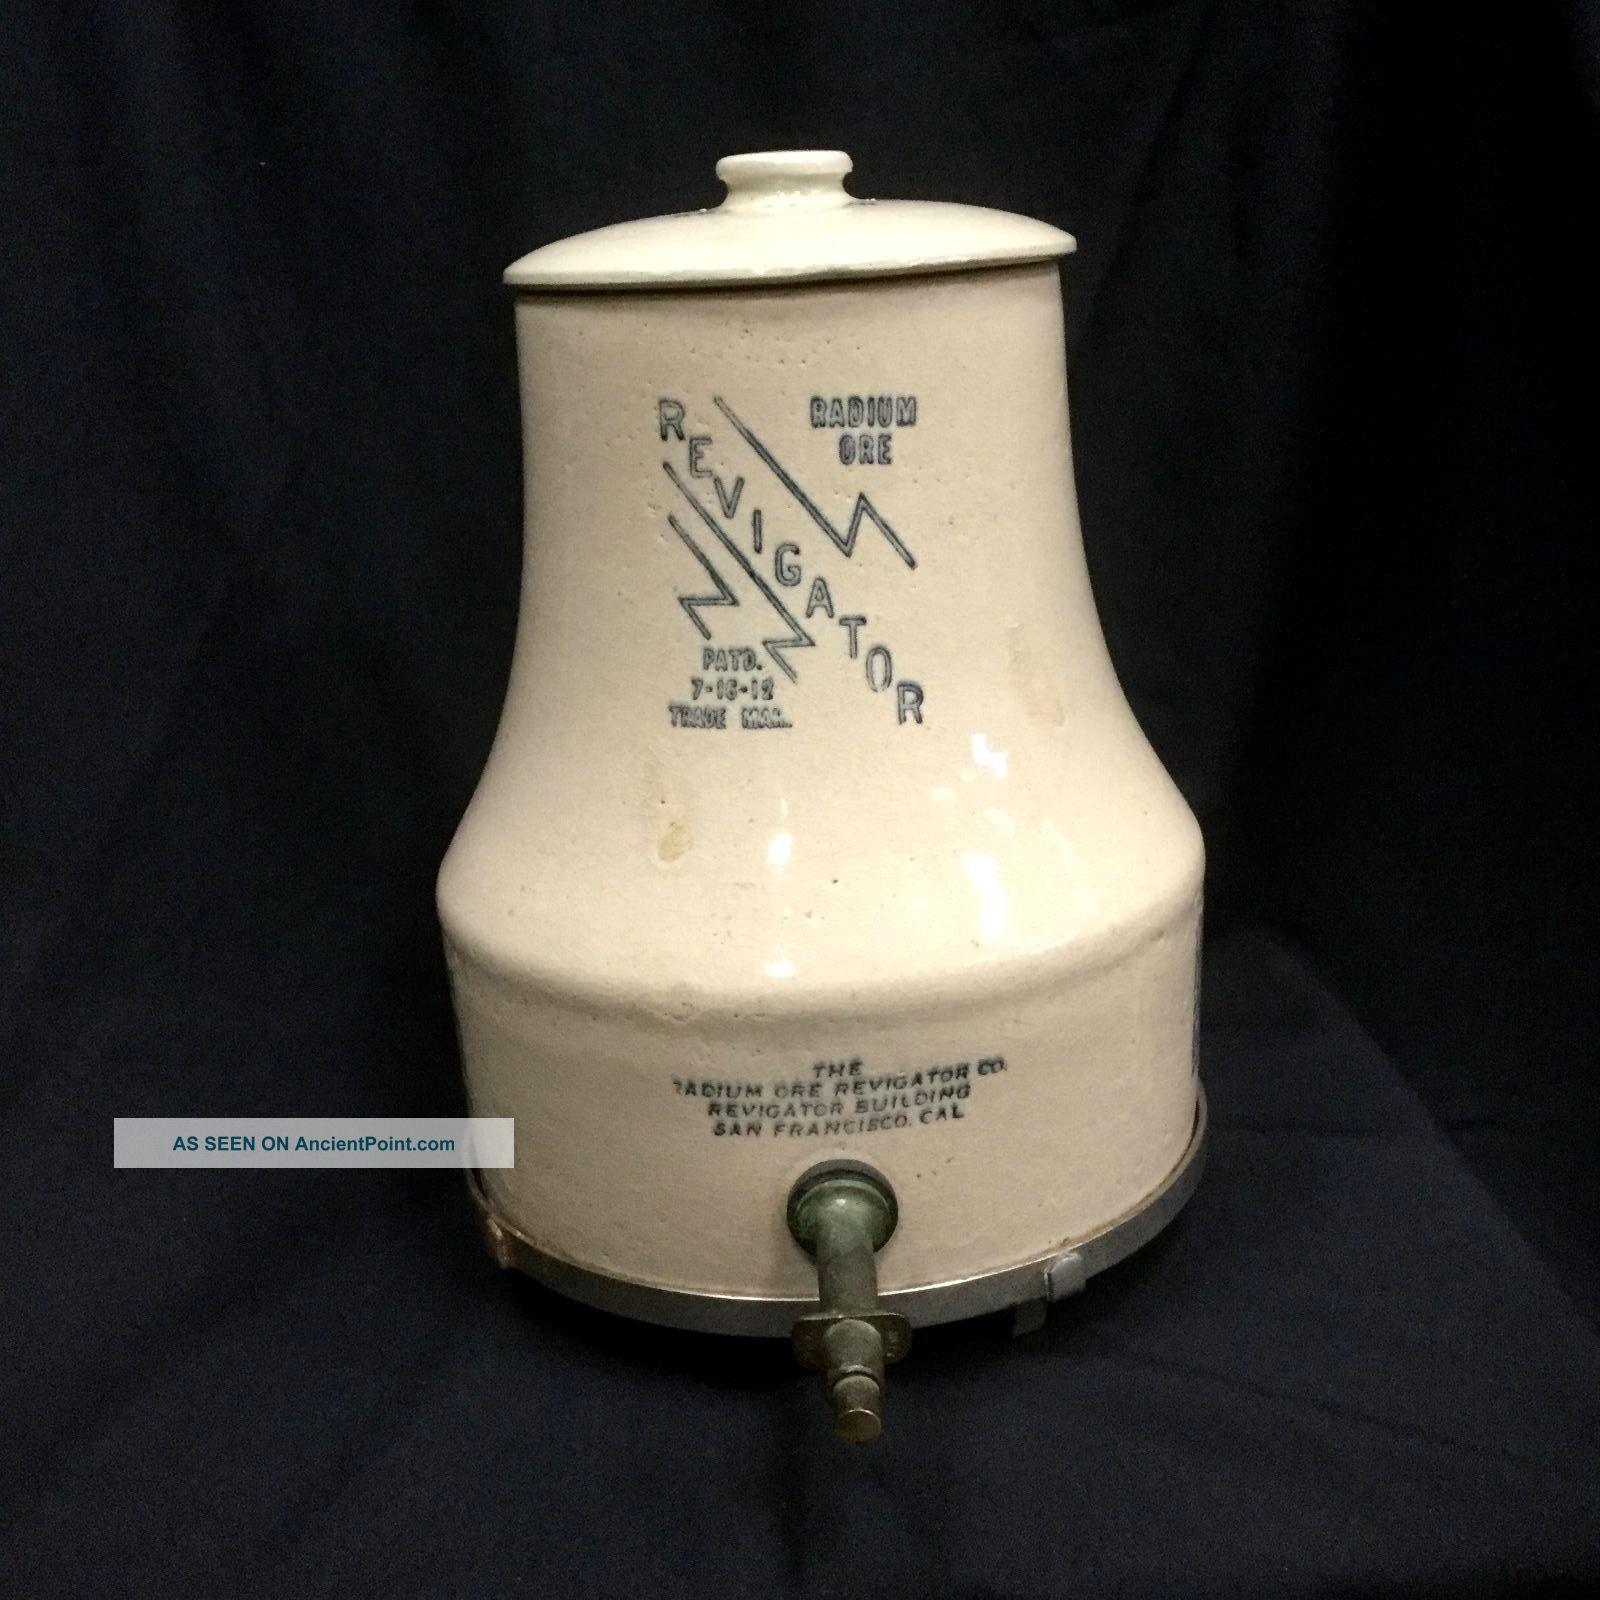 1912 Stoneware Radium Ore Revigator Complete With Lid,  Spigot And Stand Quack Medicine photo